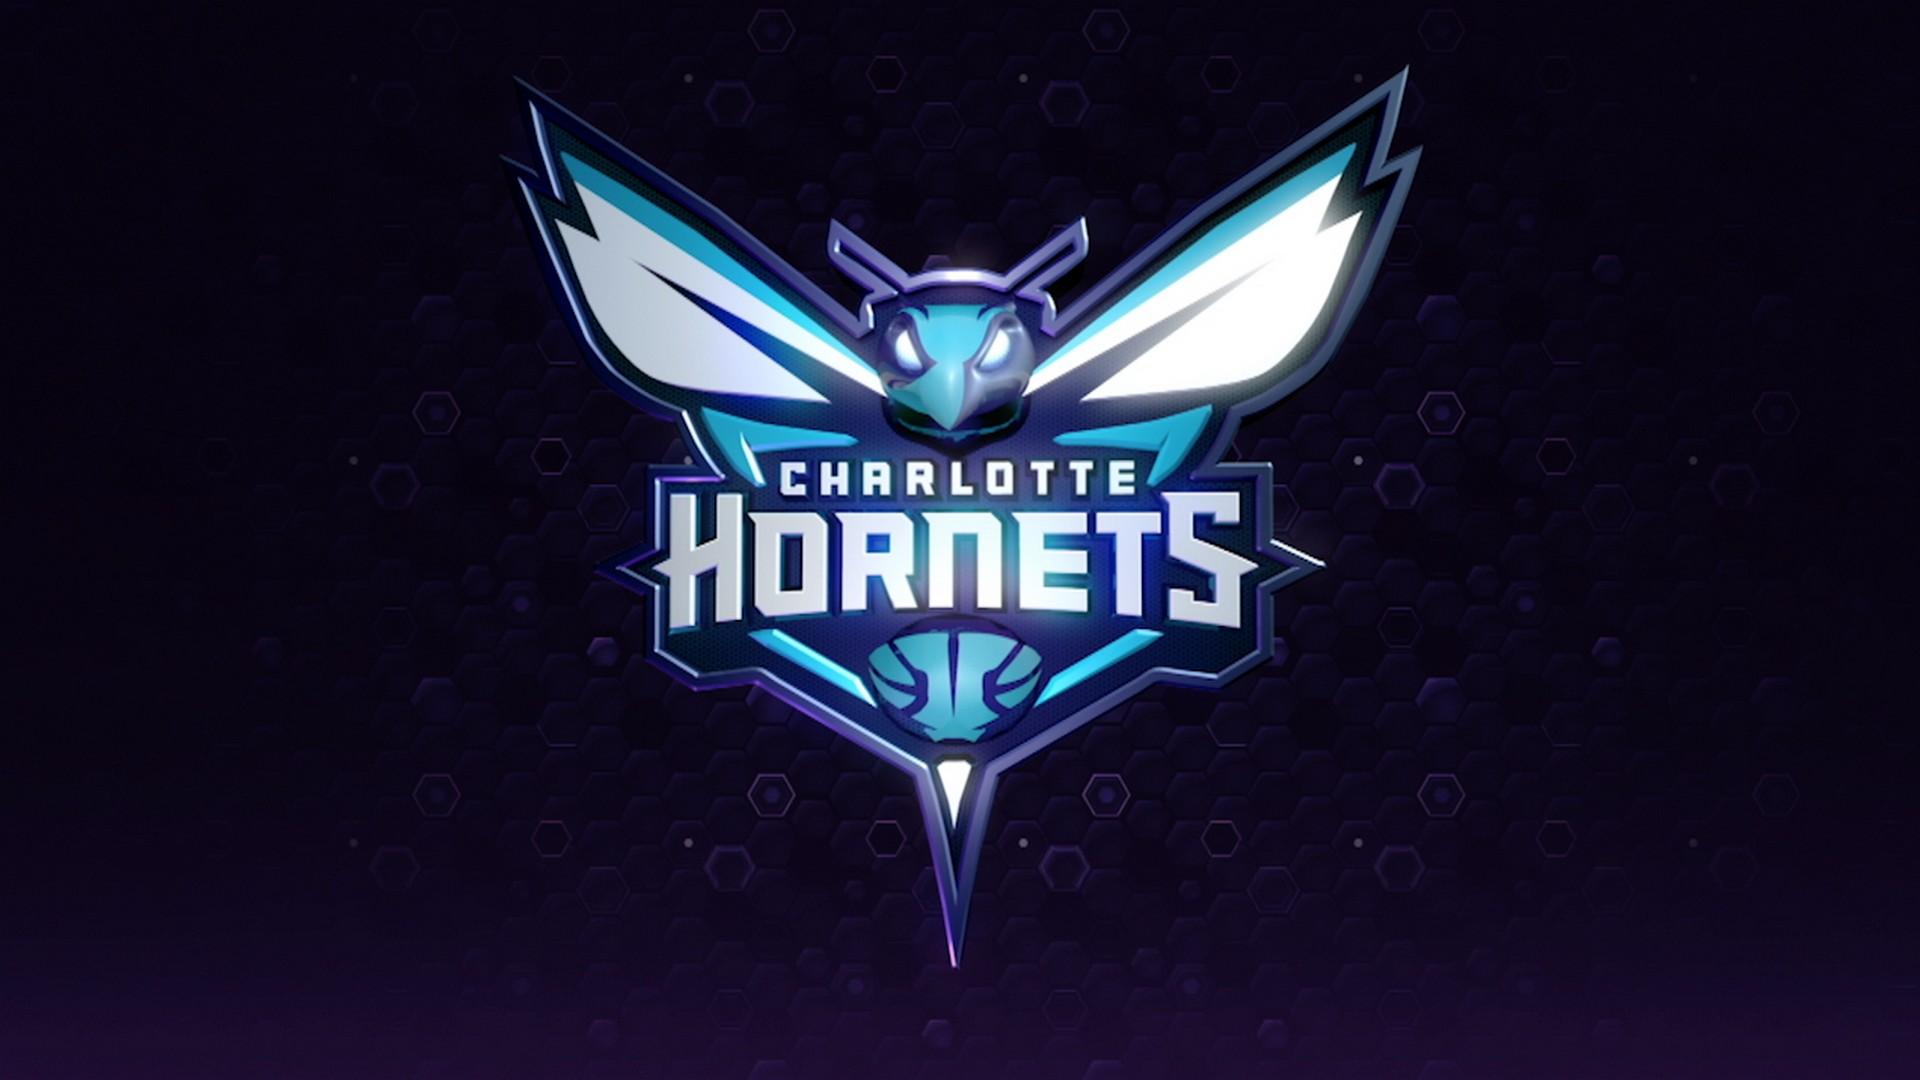 Charlotte Hornets Mac Backgrounds 2019 Basketball Wallpaper 1920x1080